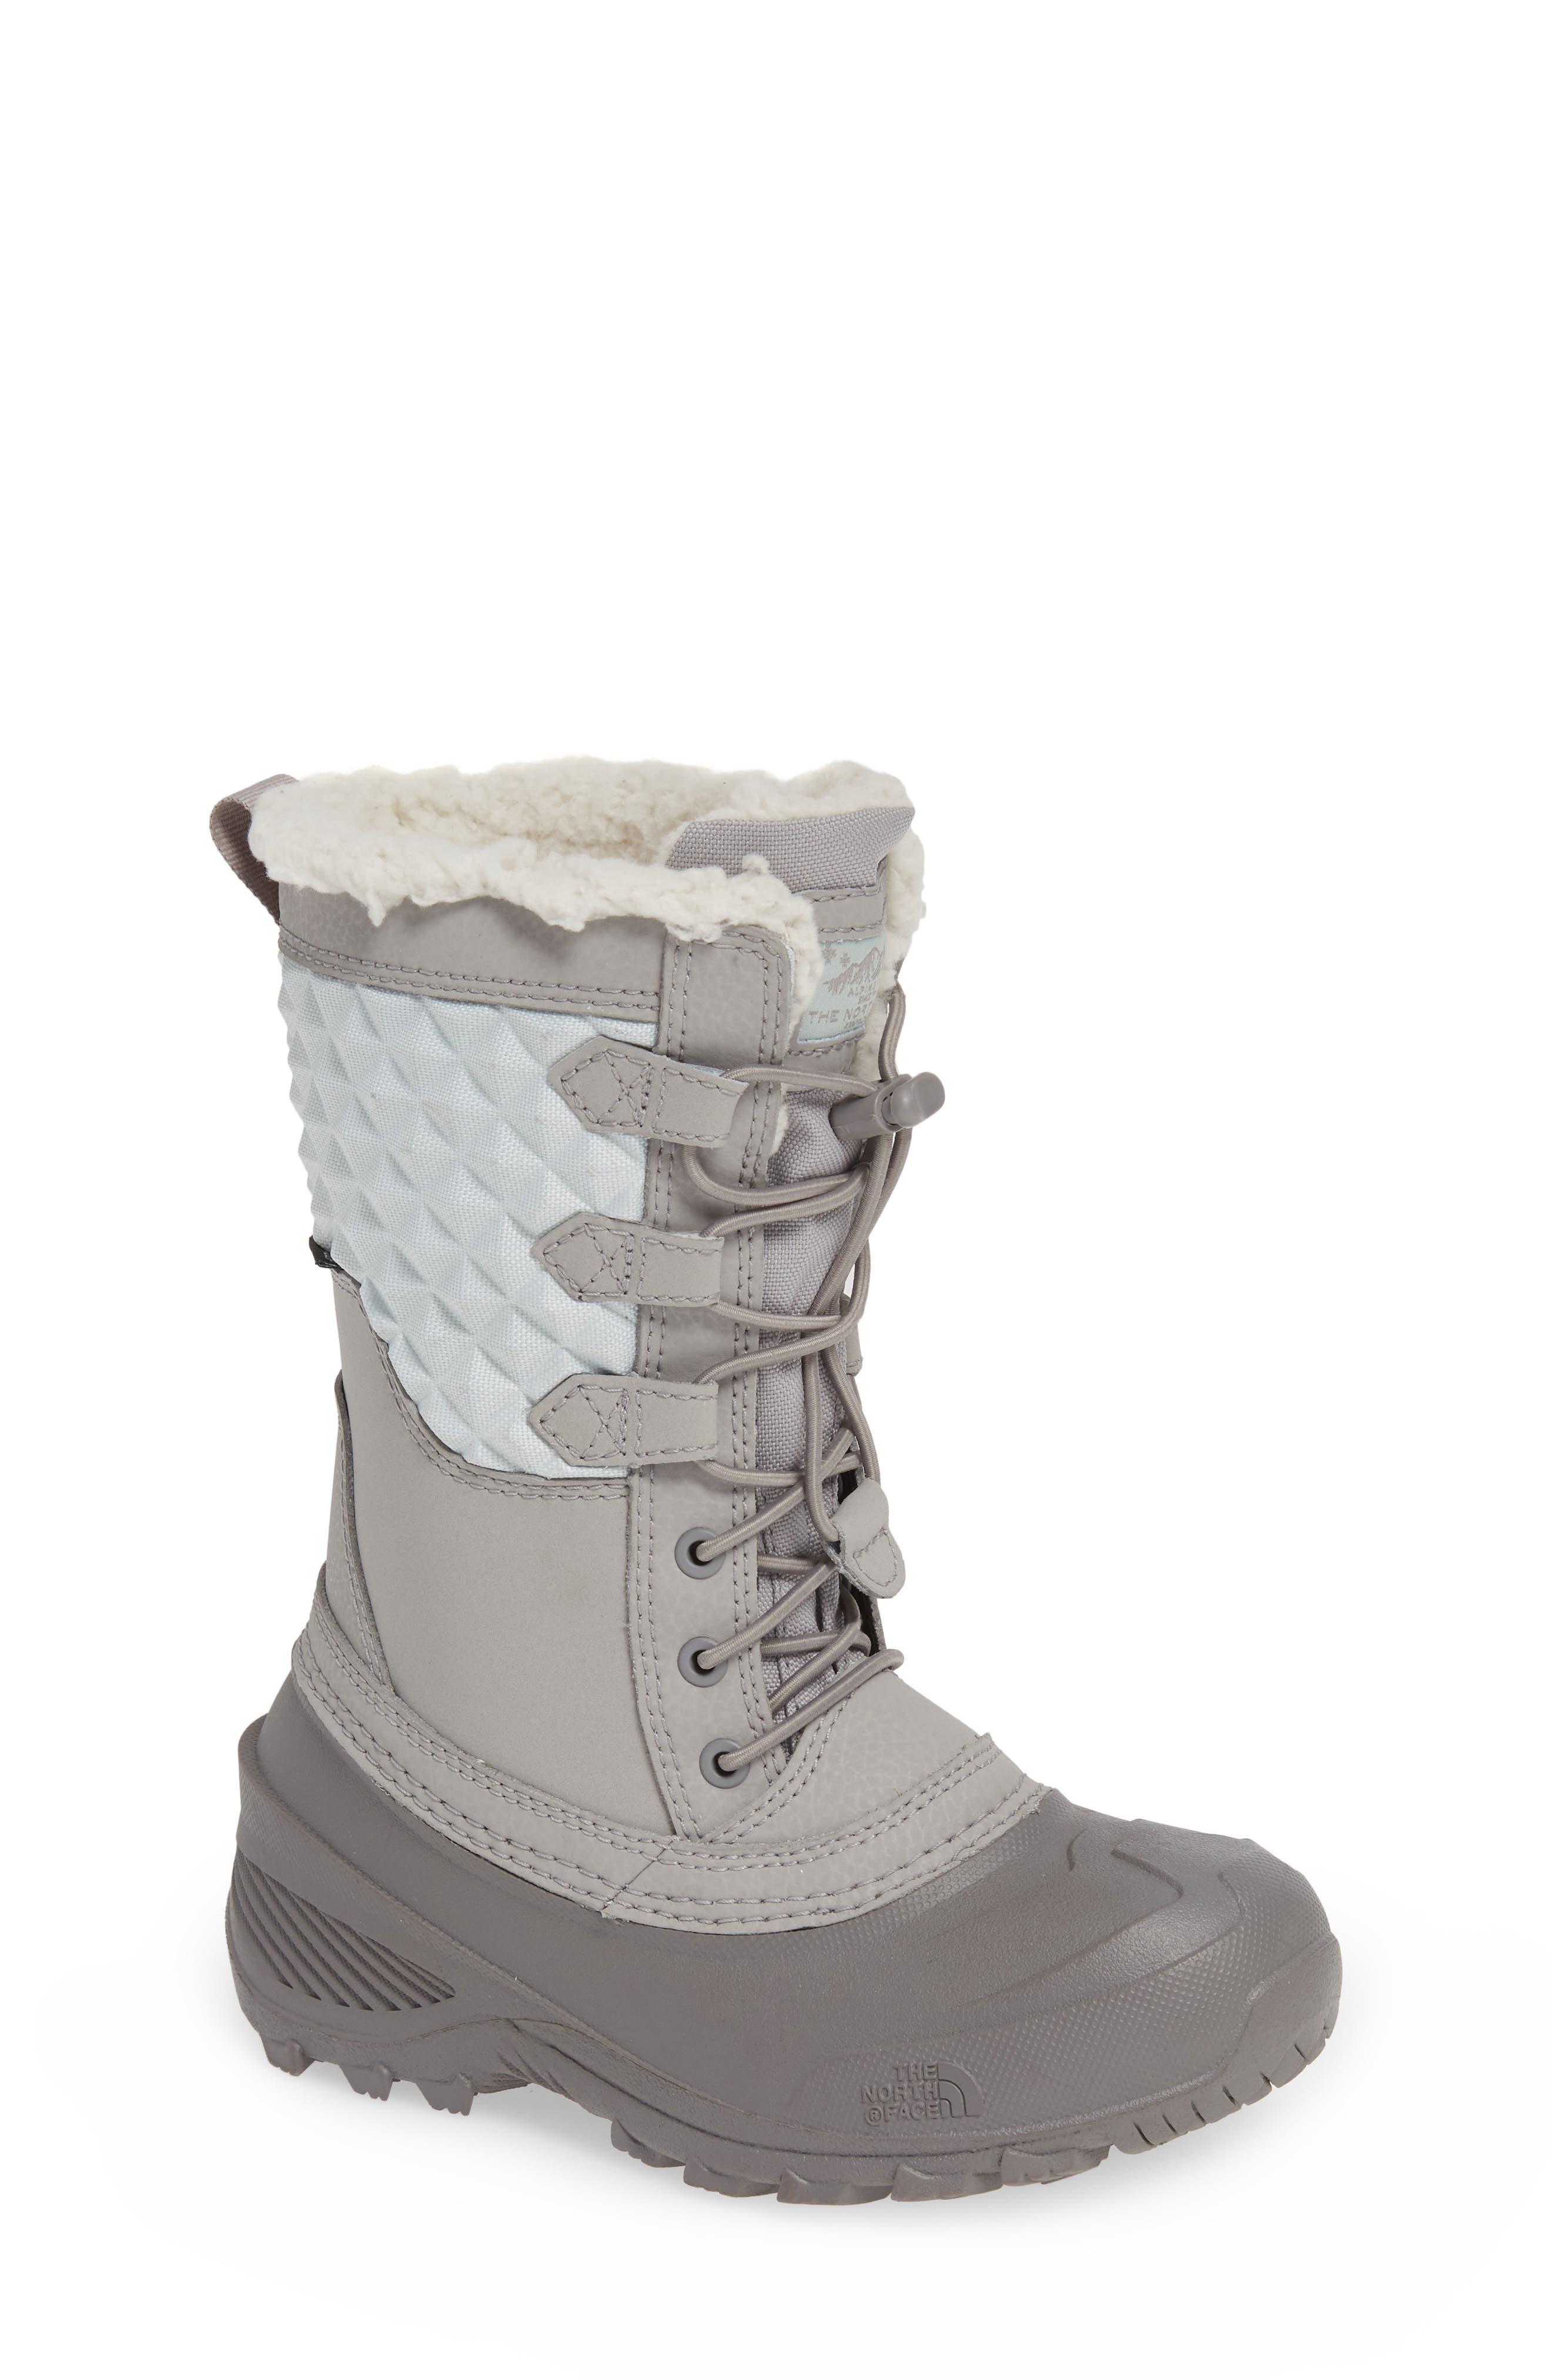 Shellista Lace III Faux Fur Waterproof Boot,                             Main thumbnail 1, color,                             030